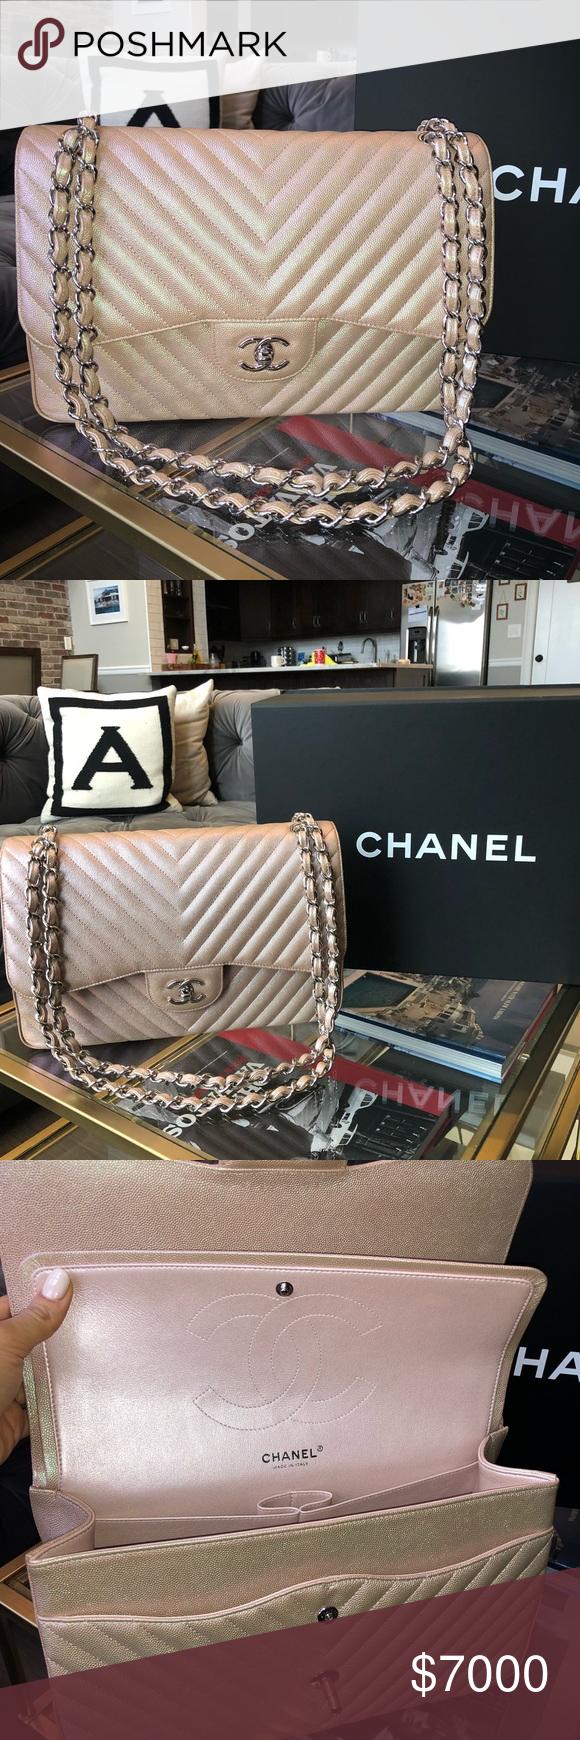 5fb941aee96d Chanel Iridescent light rose gold Chevron Jumbo NIB CHANEL 2017 17B LIGHT  IRIDESCENT ROSE GOLD CAVIAR